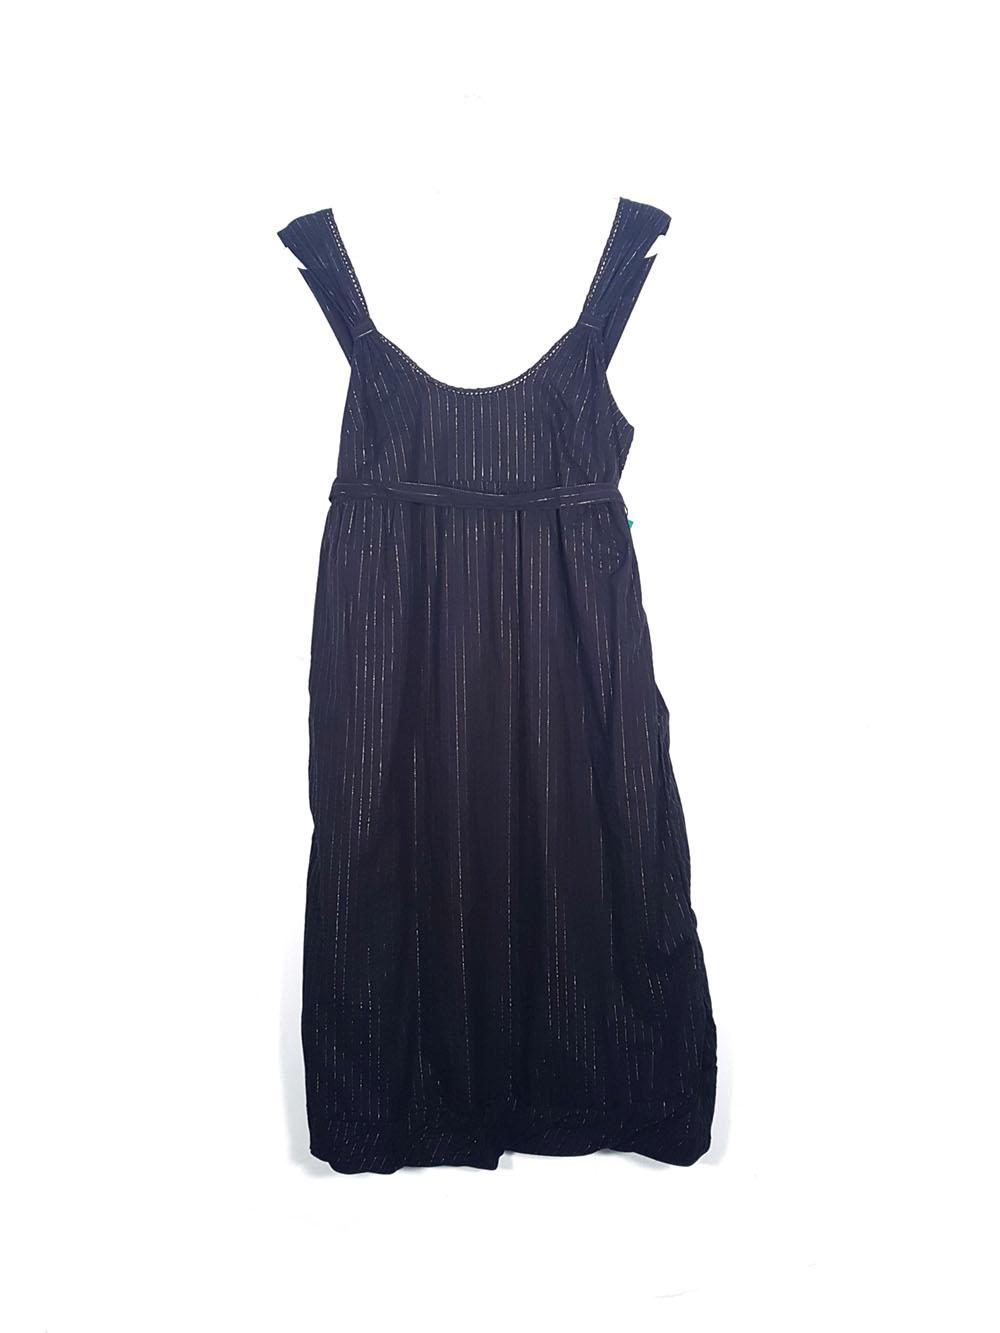 d736089c1 Vestido negro rayas Benetton